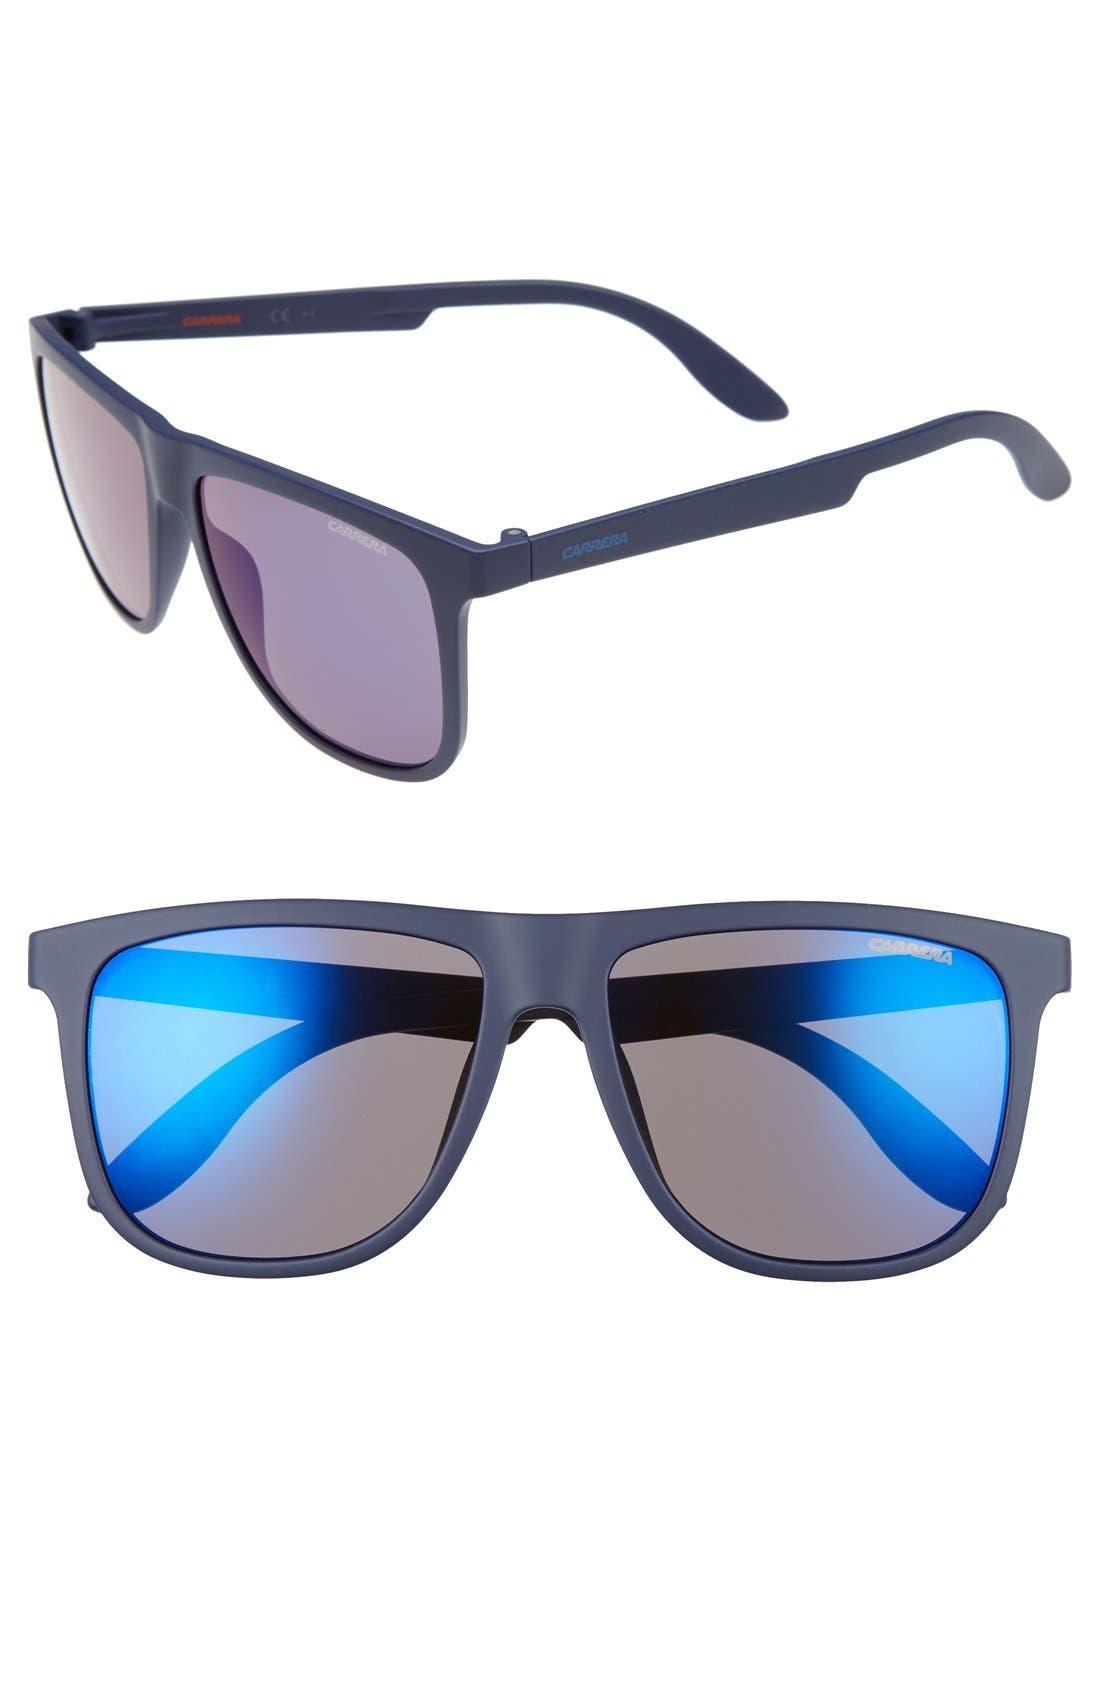 5003ST 57mm Sunglasses,                             Main thumbnail 1, color,                             Blue